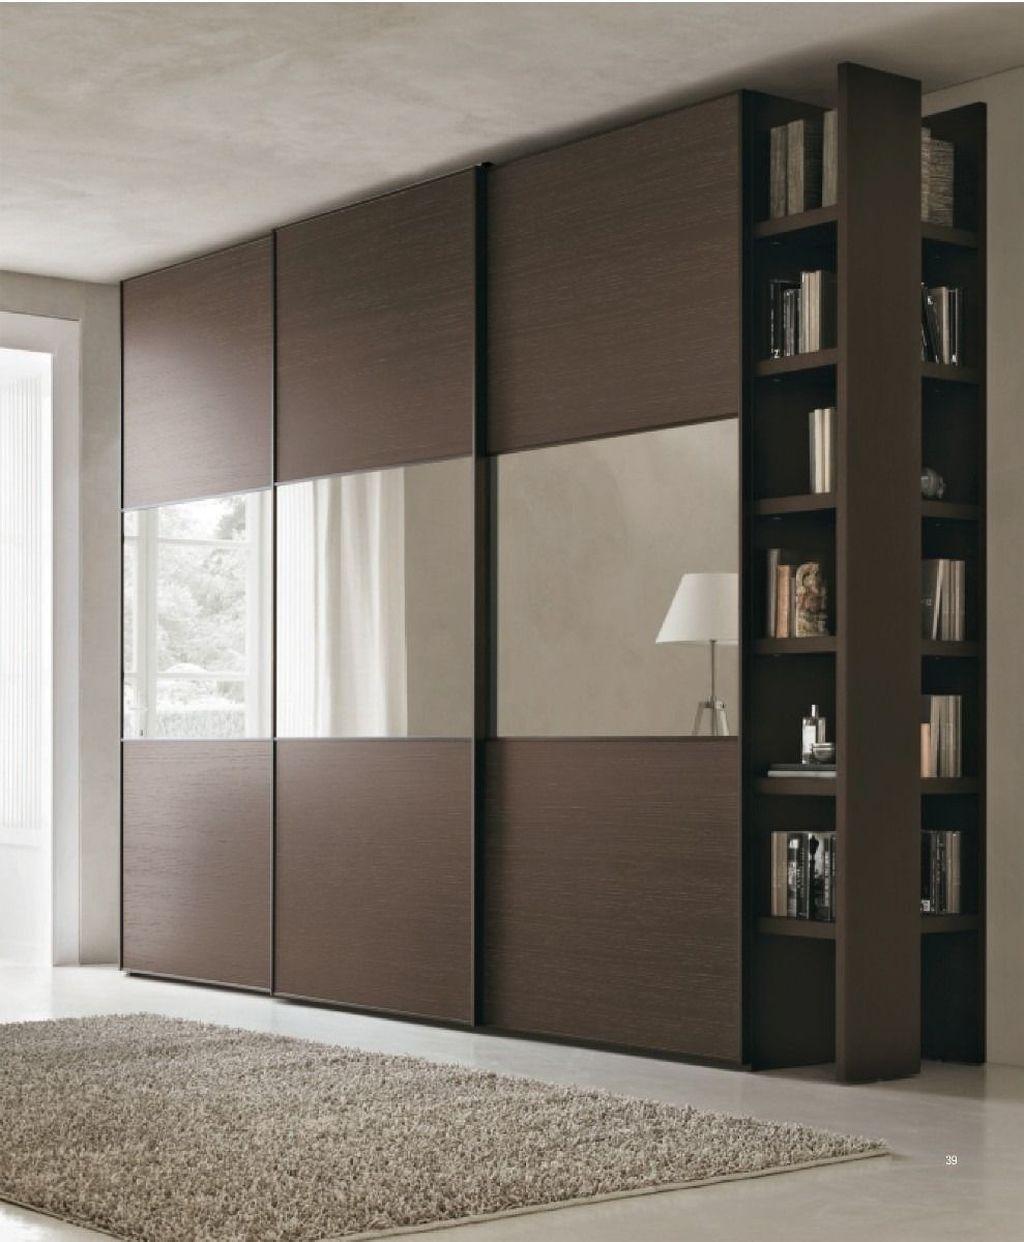 Rustic Wardrobe Design Ideas That Is In Trend 50